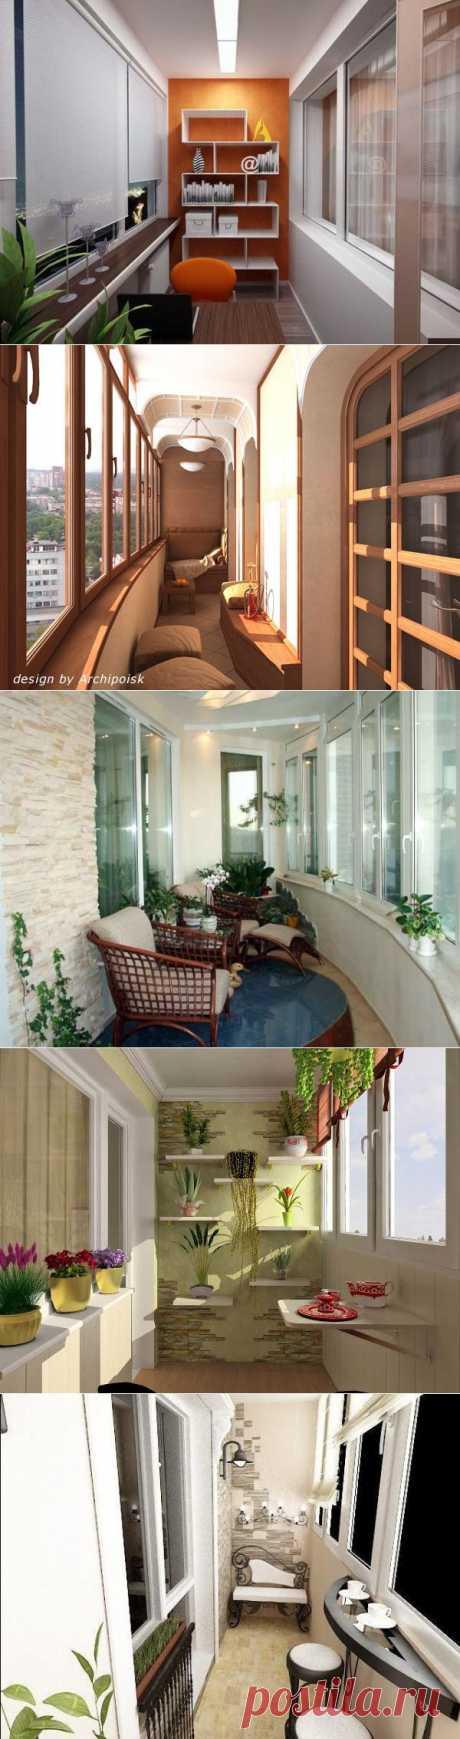 Создаём красоту на балконе | Домохозяйки